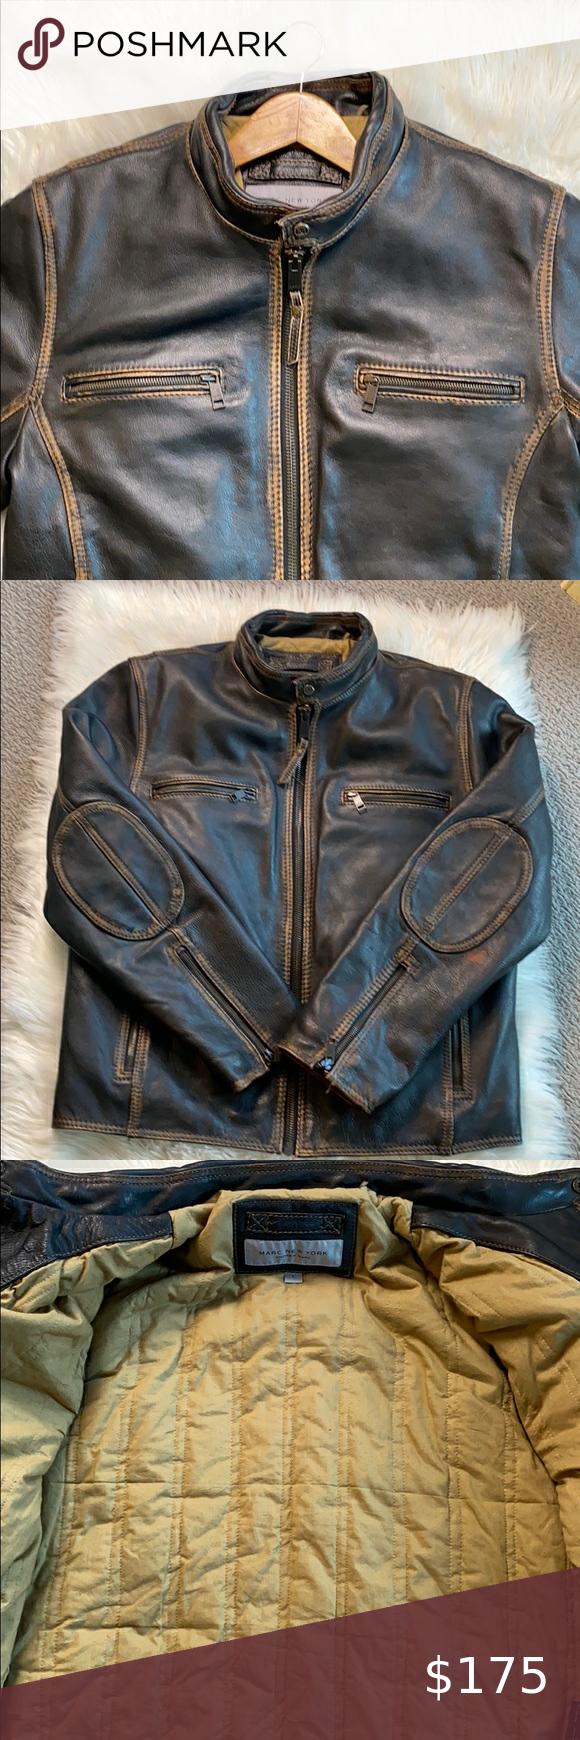 Marc Andrews Distressed Leather Jacket Men S Distressed Leather Jacket Leather Jacket Leather Jacket Men [ 1740 x 580 Pixel ]